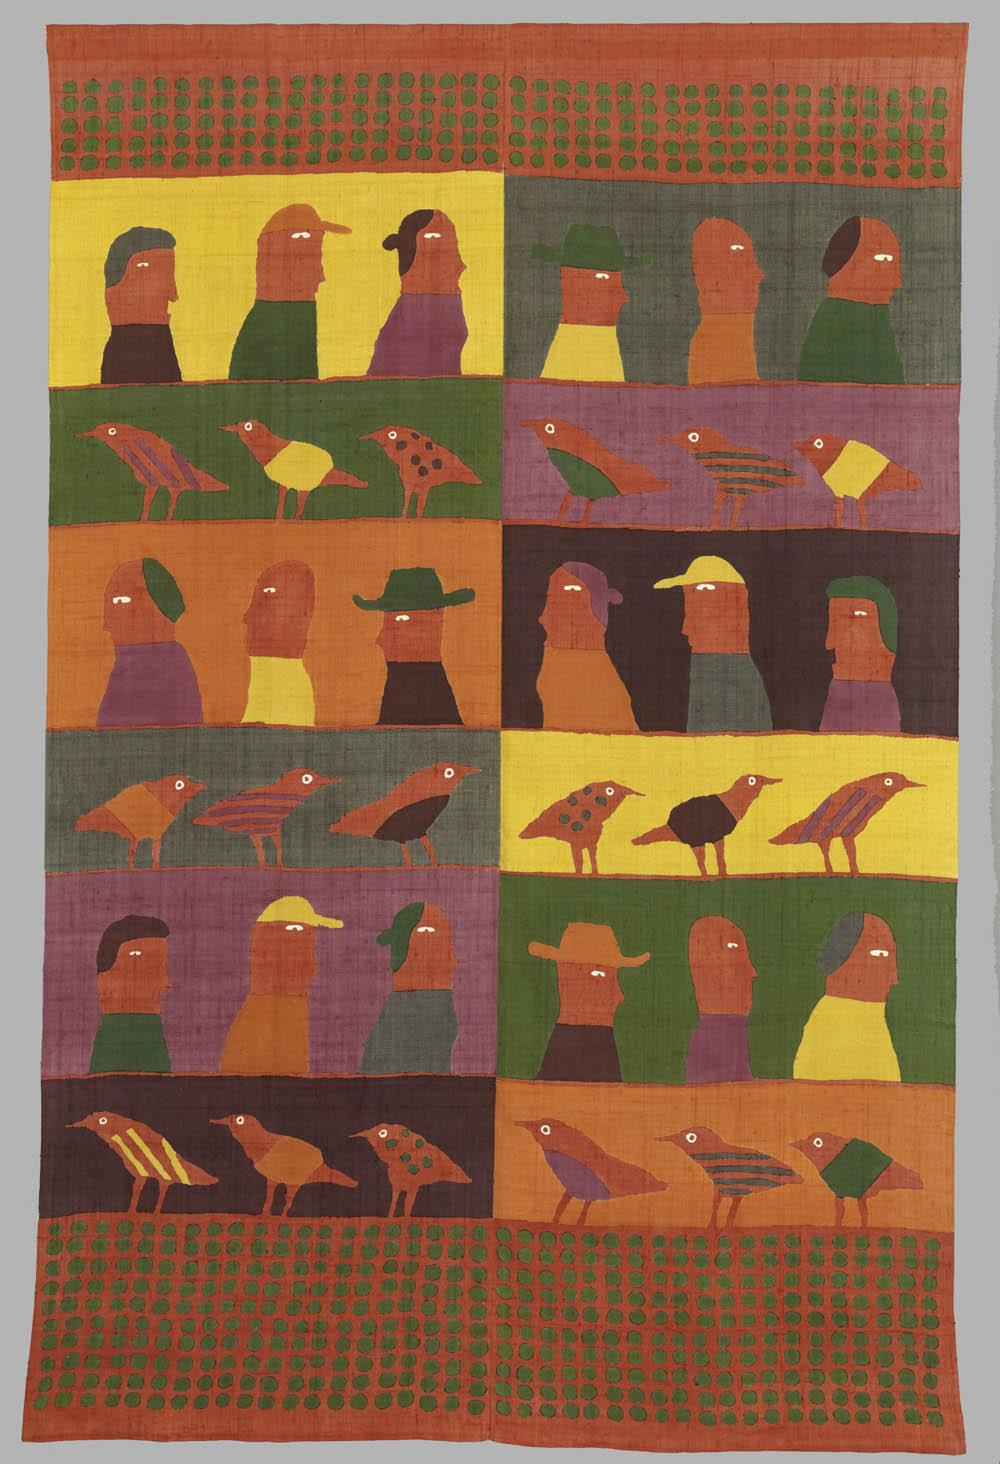 'To line '83',1983, Silk, 239 x 155 cm, Don Samirō Yunoki, 2013 - MA 12571, © Paris, RMN - Grand Palais (Musée Guimet, Paris) / Thierry Ollivier